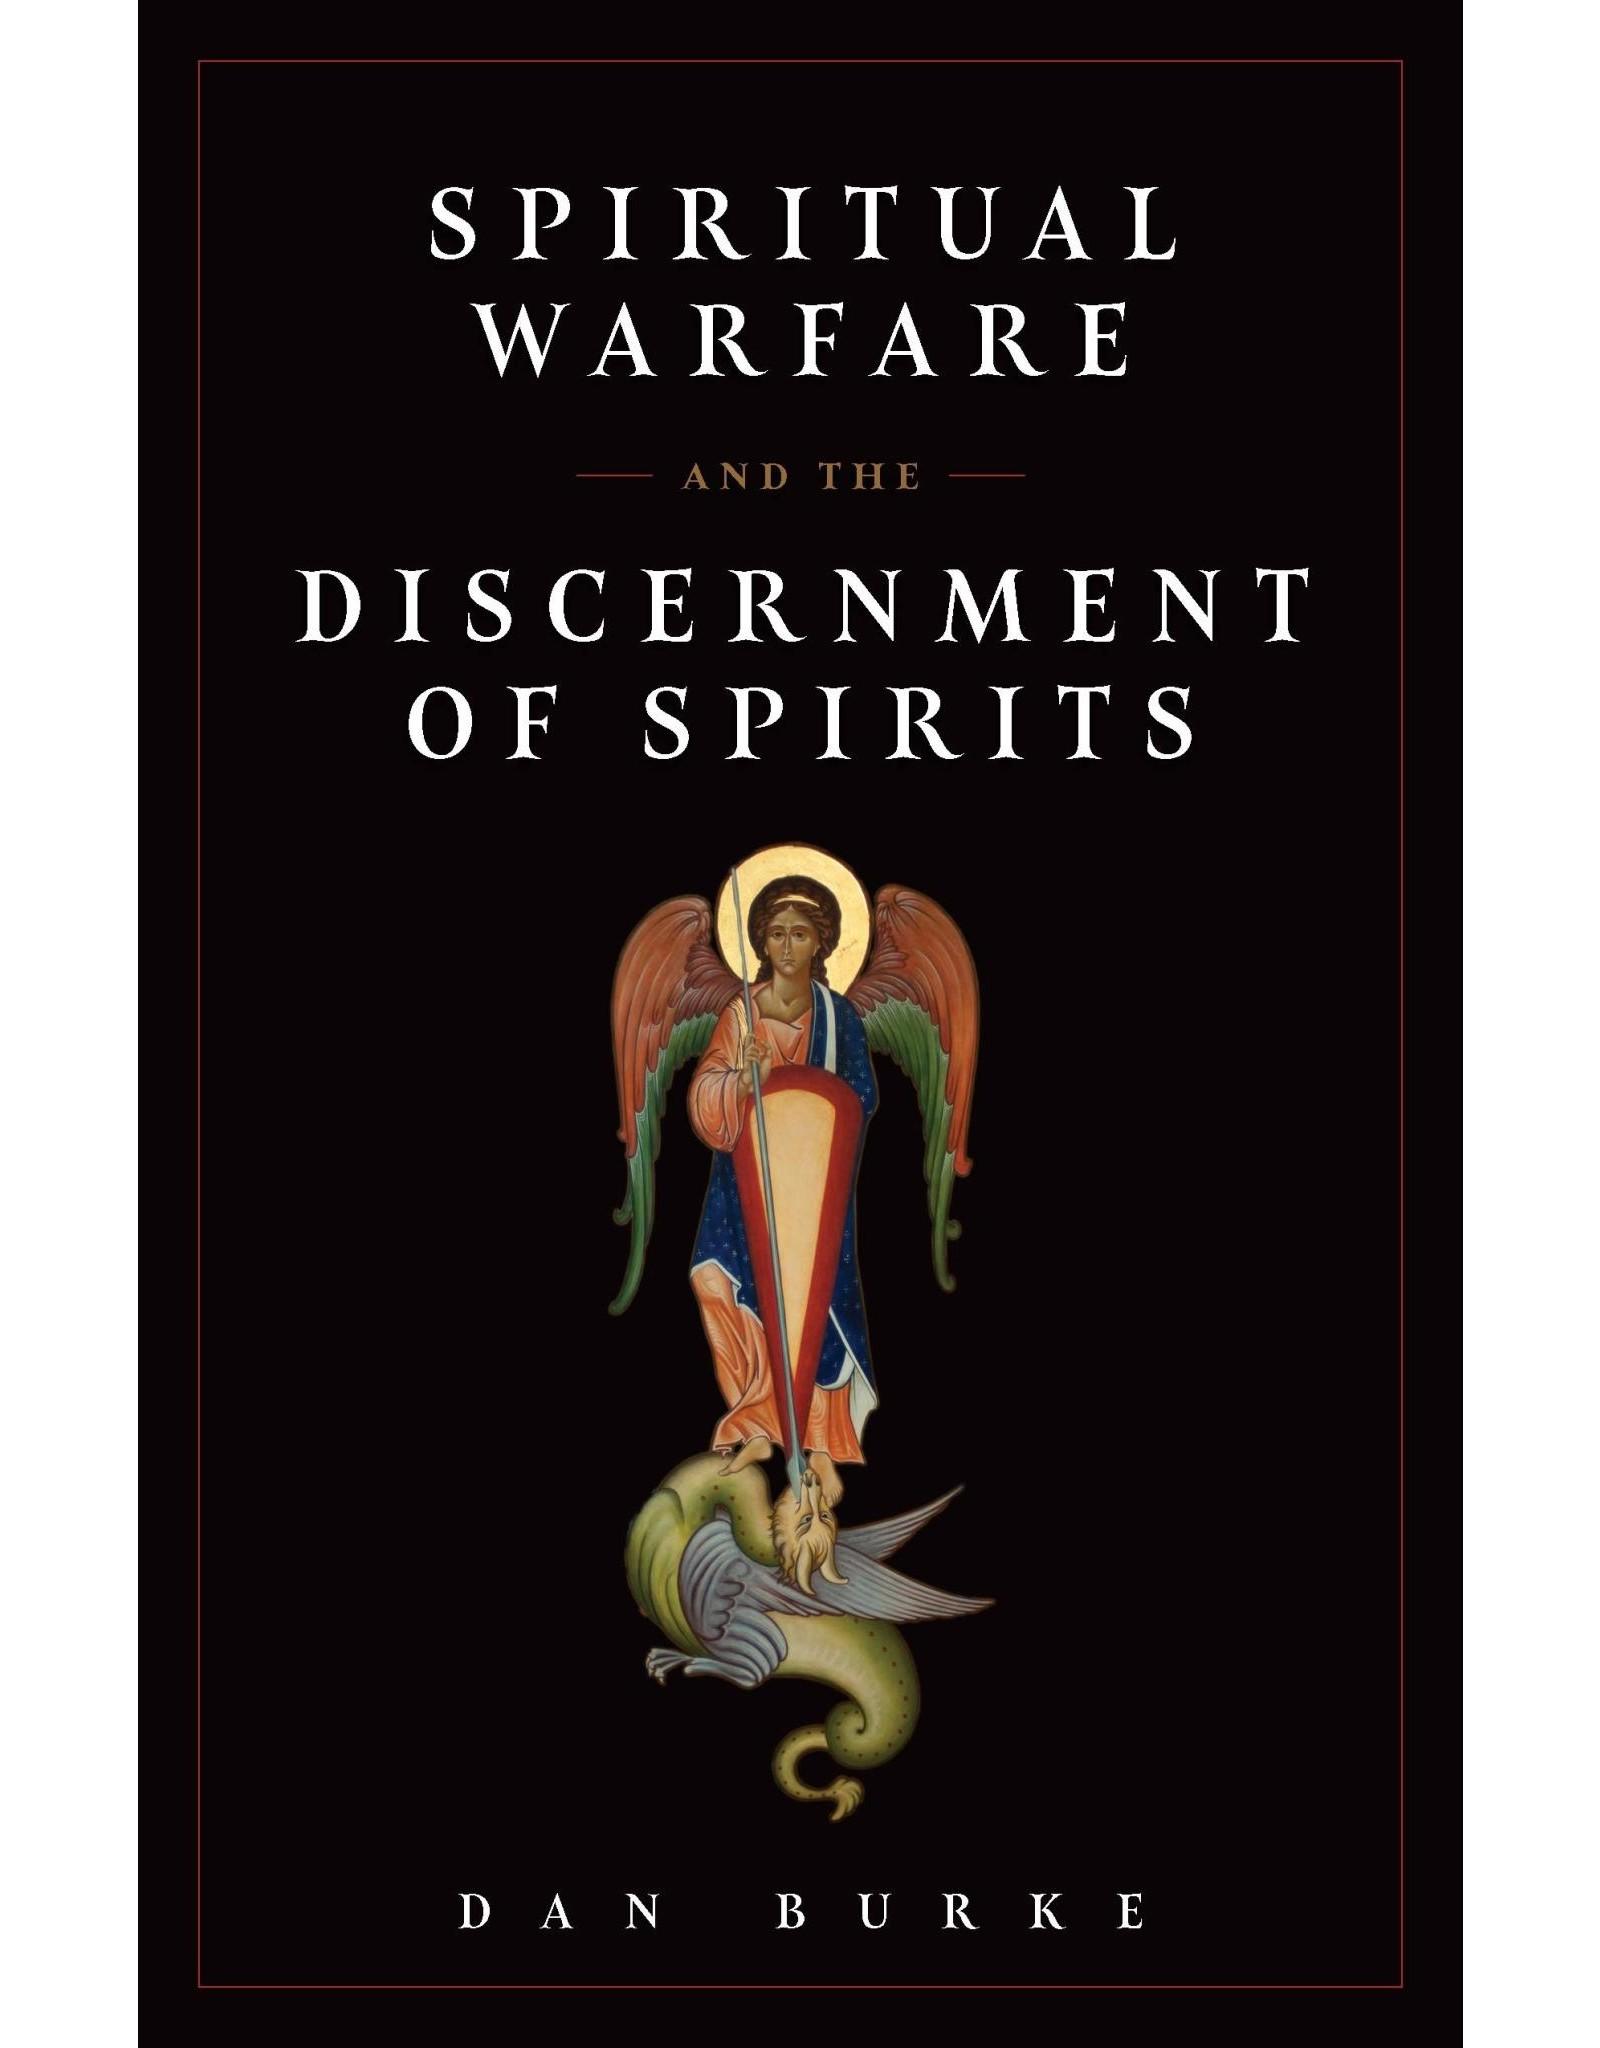 Spiritual Warfare & the Discernment of Spirits